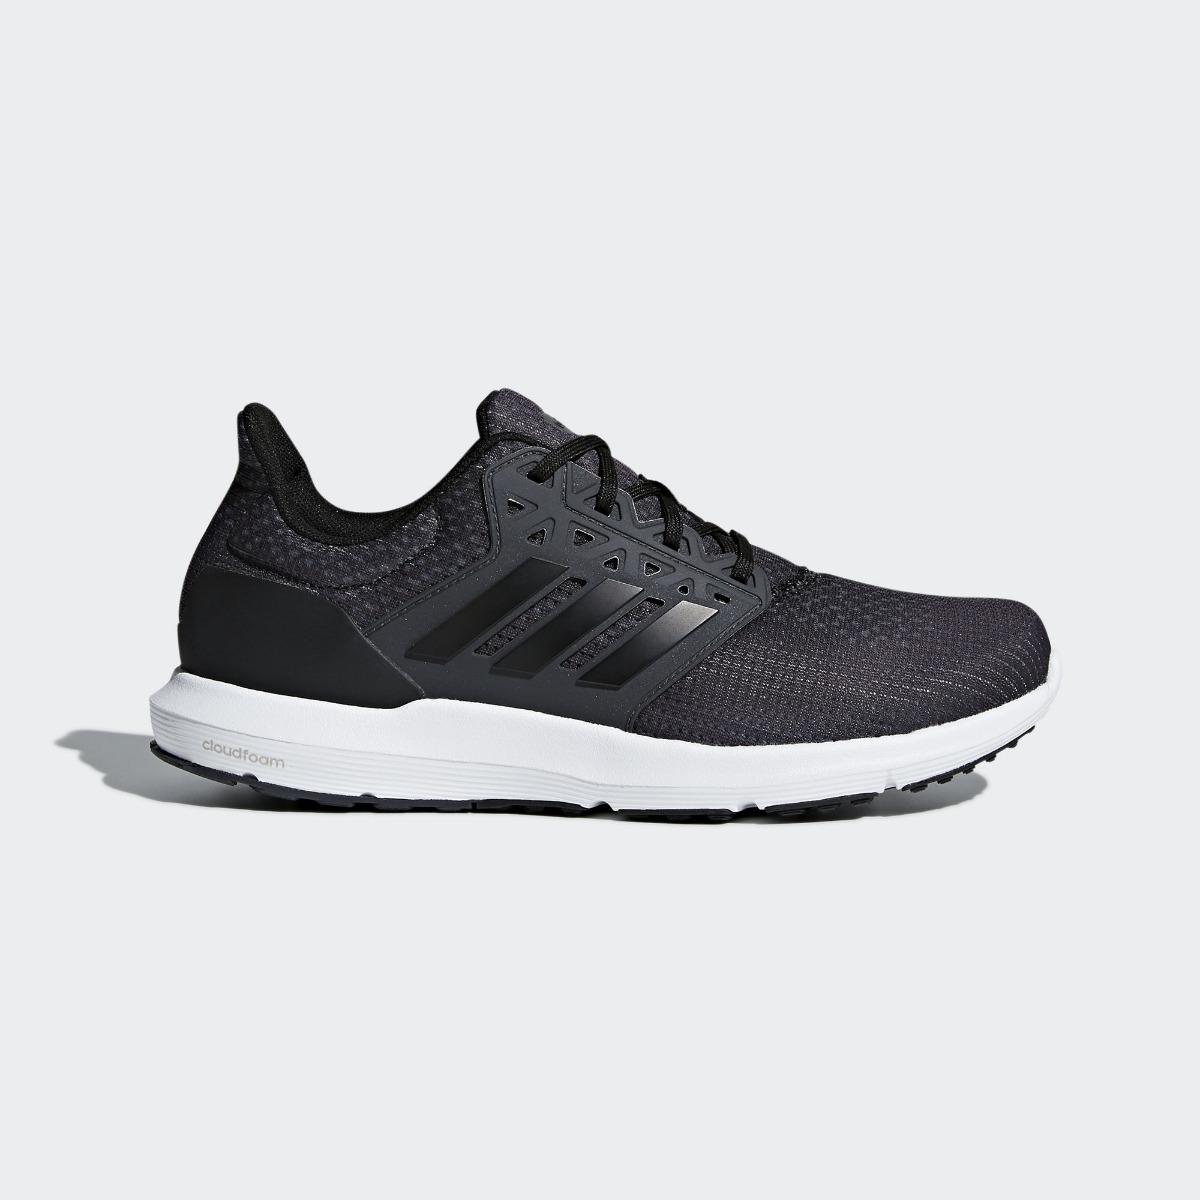 5bf6ef4e0 zapatillas running adidas hombre cp9340 solix. Cargando zoom.